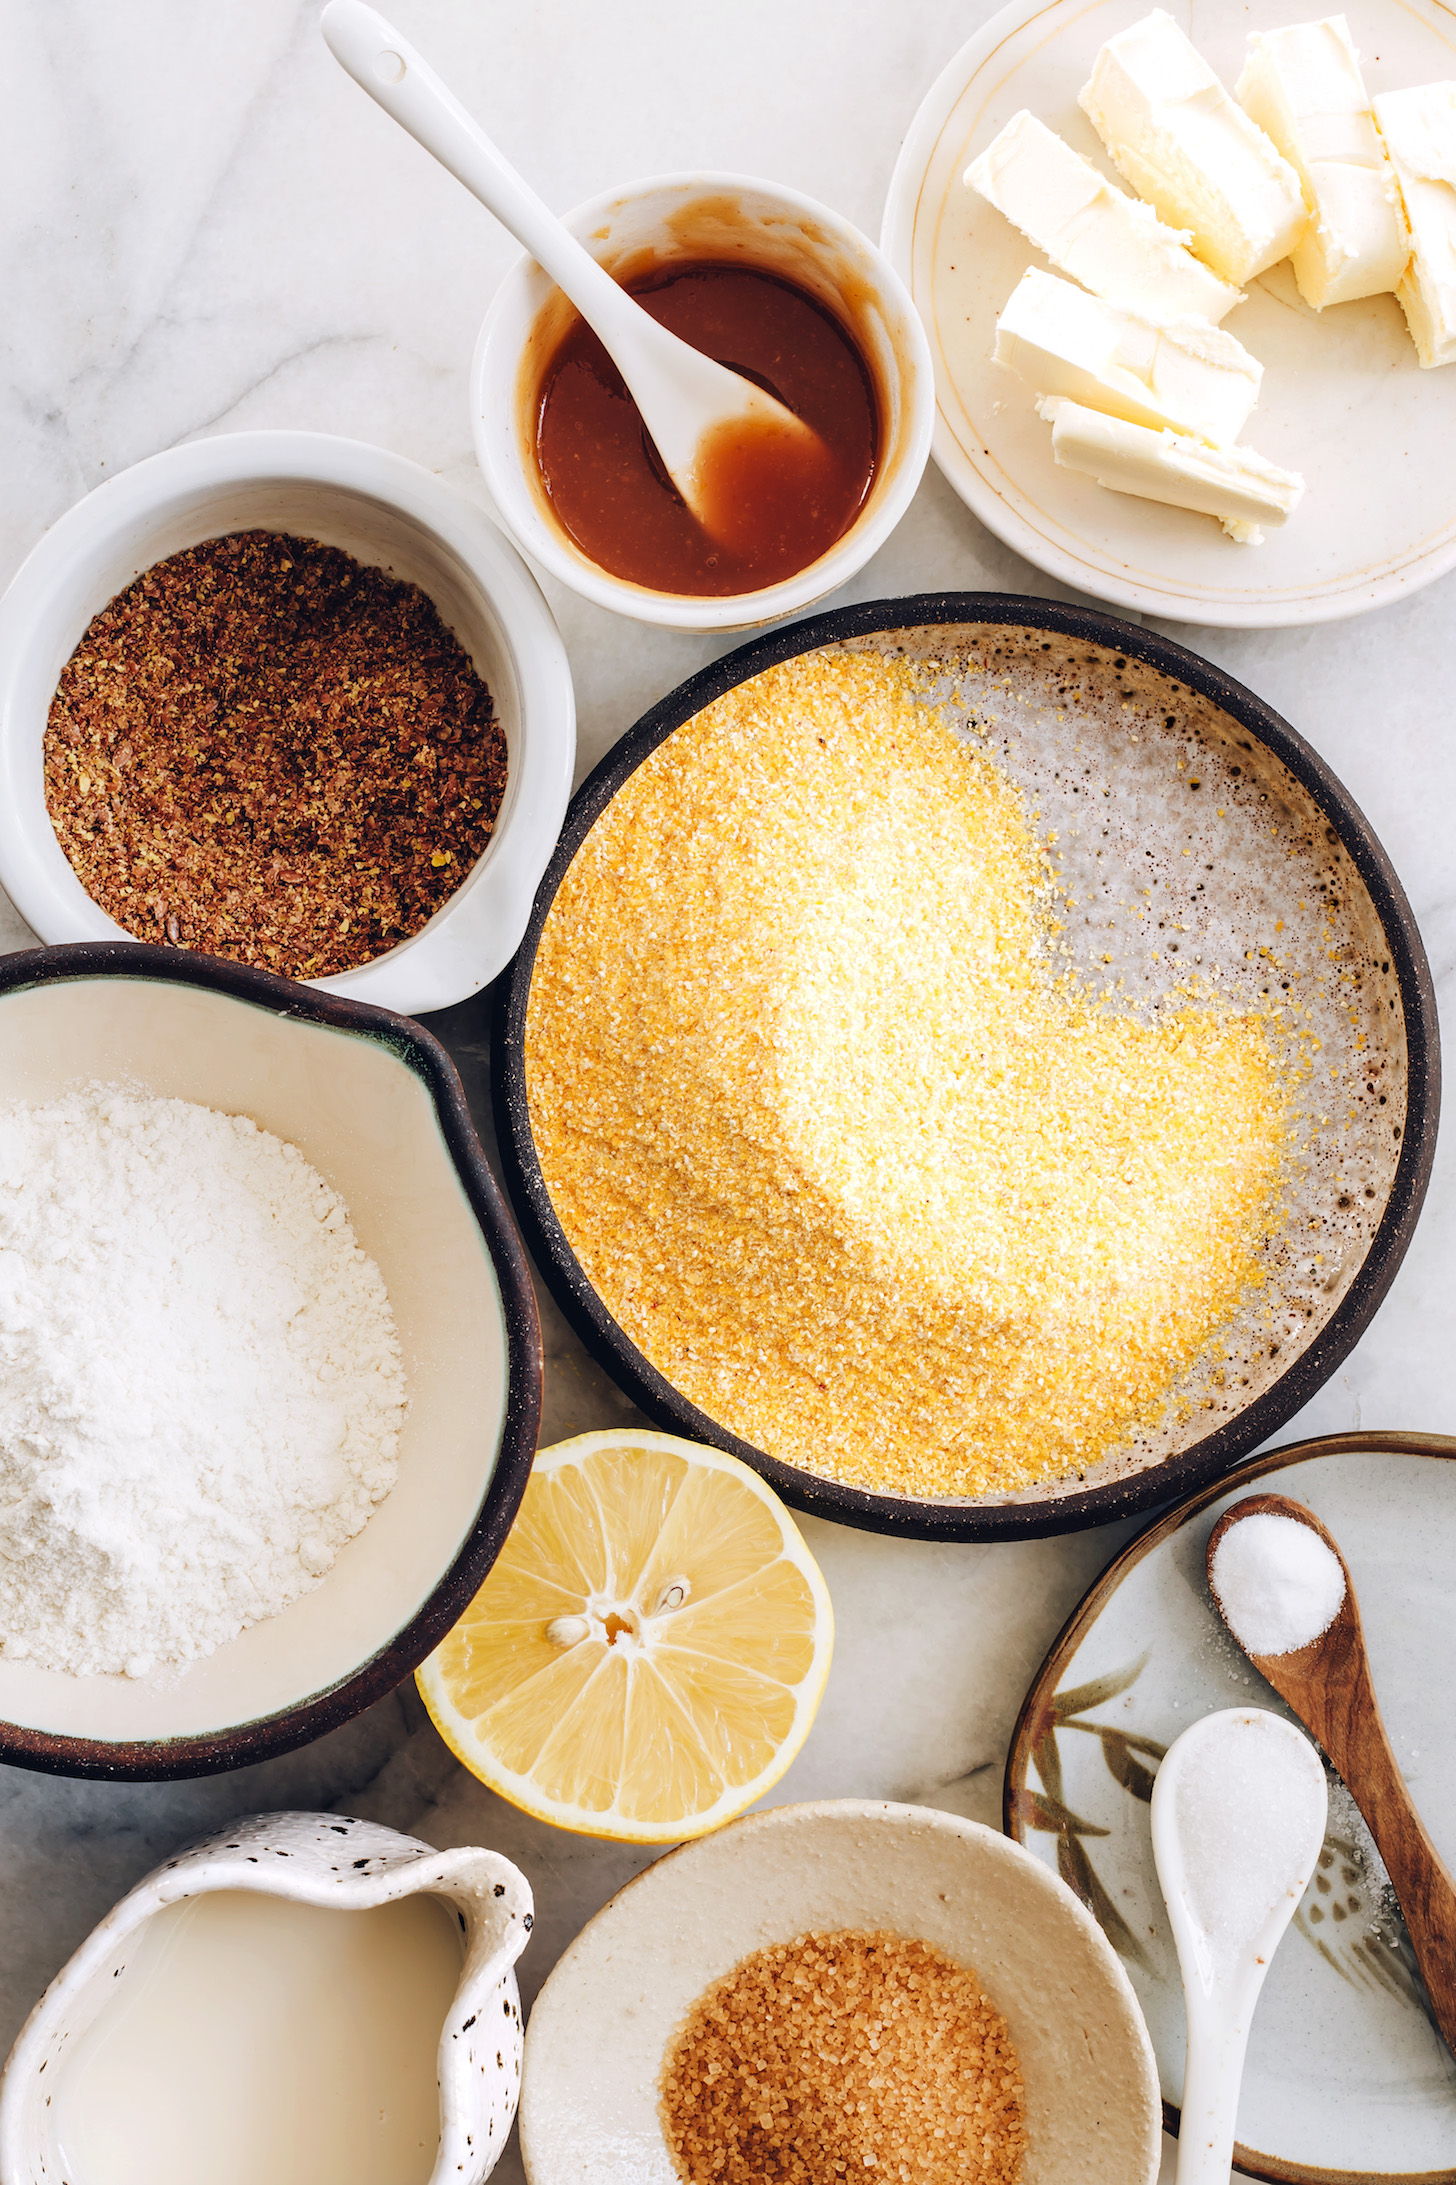 Cornmeal, flour, ground flax, lemon, almond milk, vegan butter, applesauce, salt, baking soda, and sugar